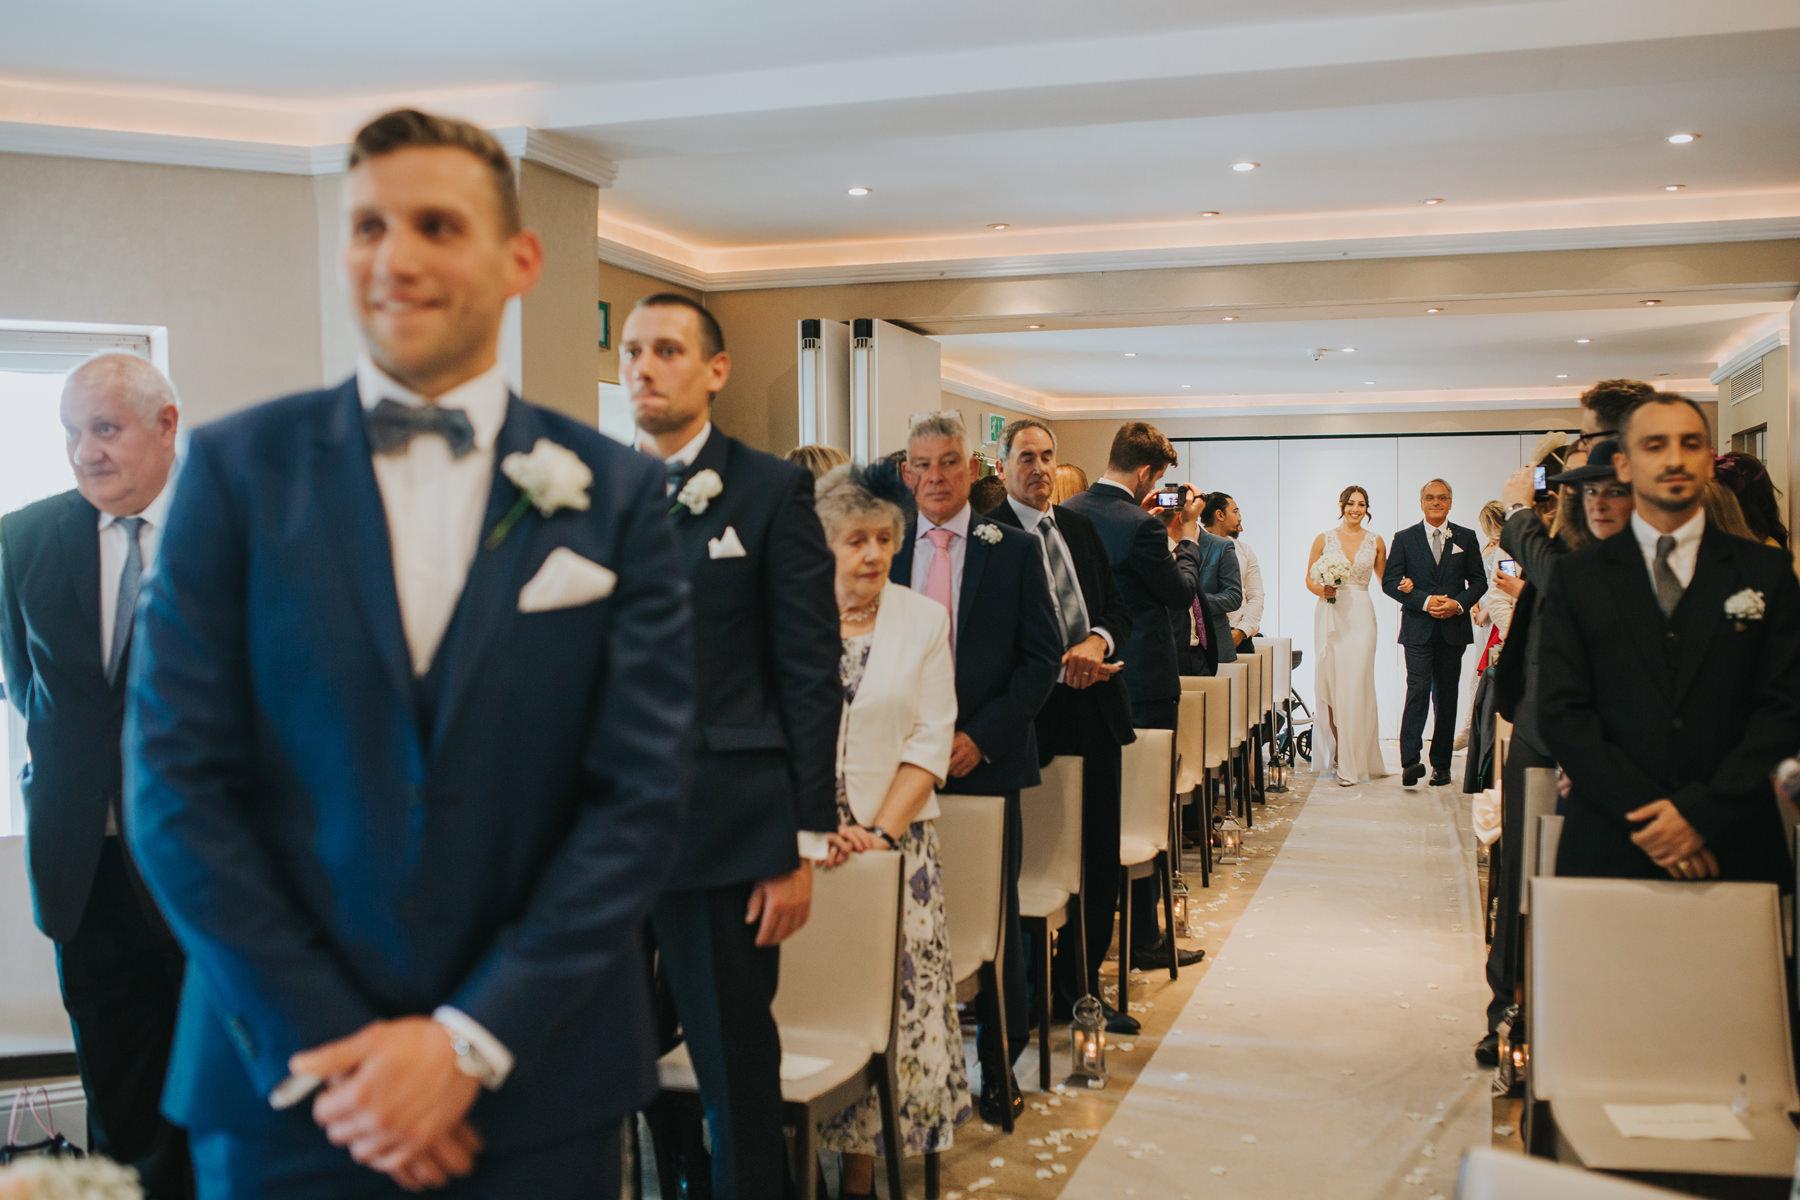 The Bingham Wedding Photographer London--groom waiting bride coming down aisle-CRL-125.jpg